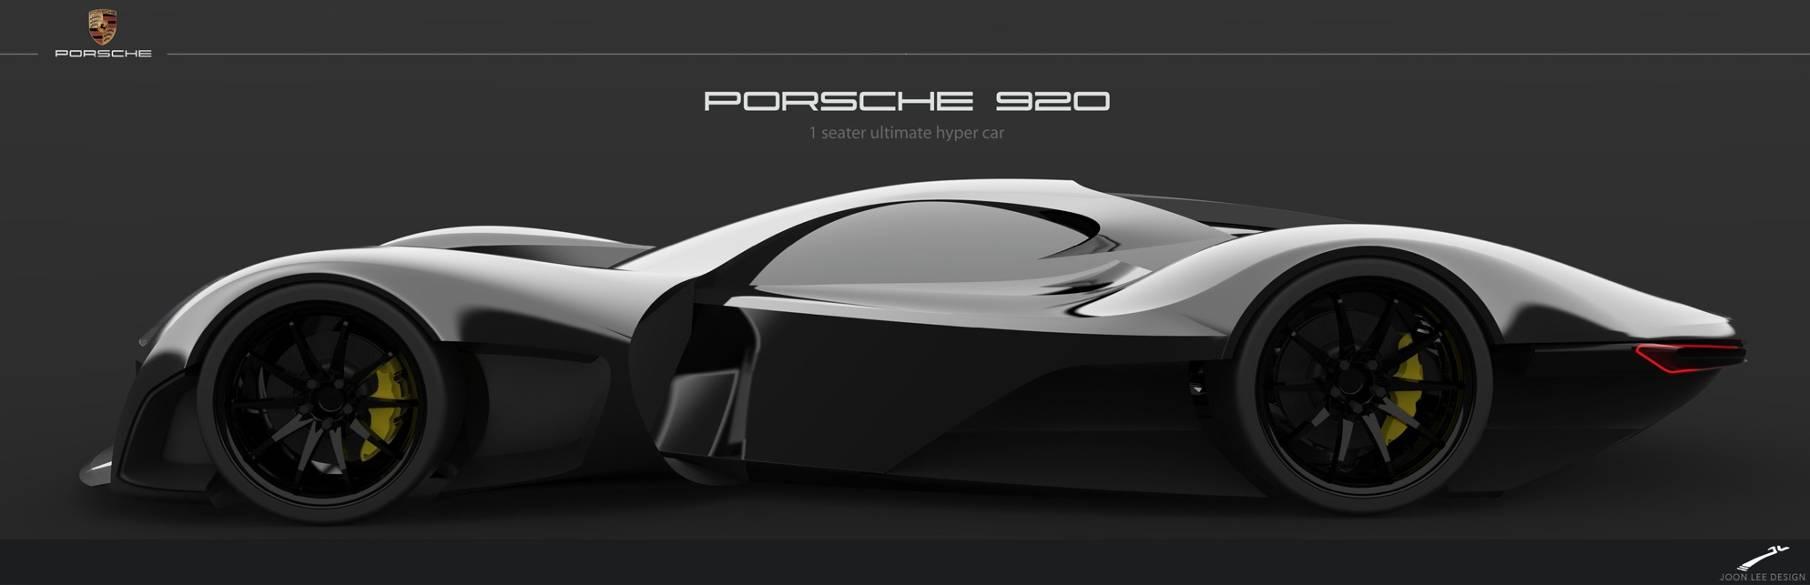 Porsche 920 Joon Lee Design